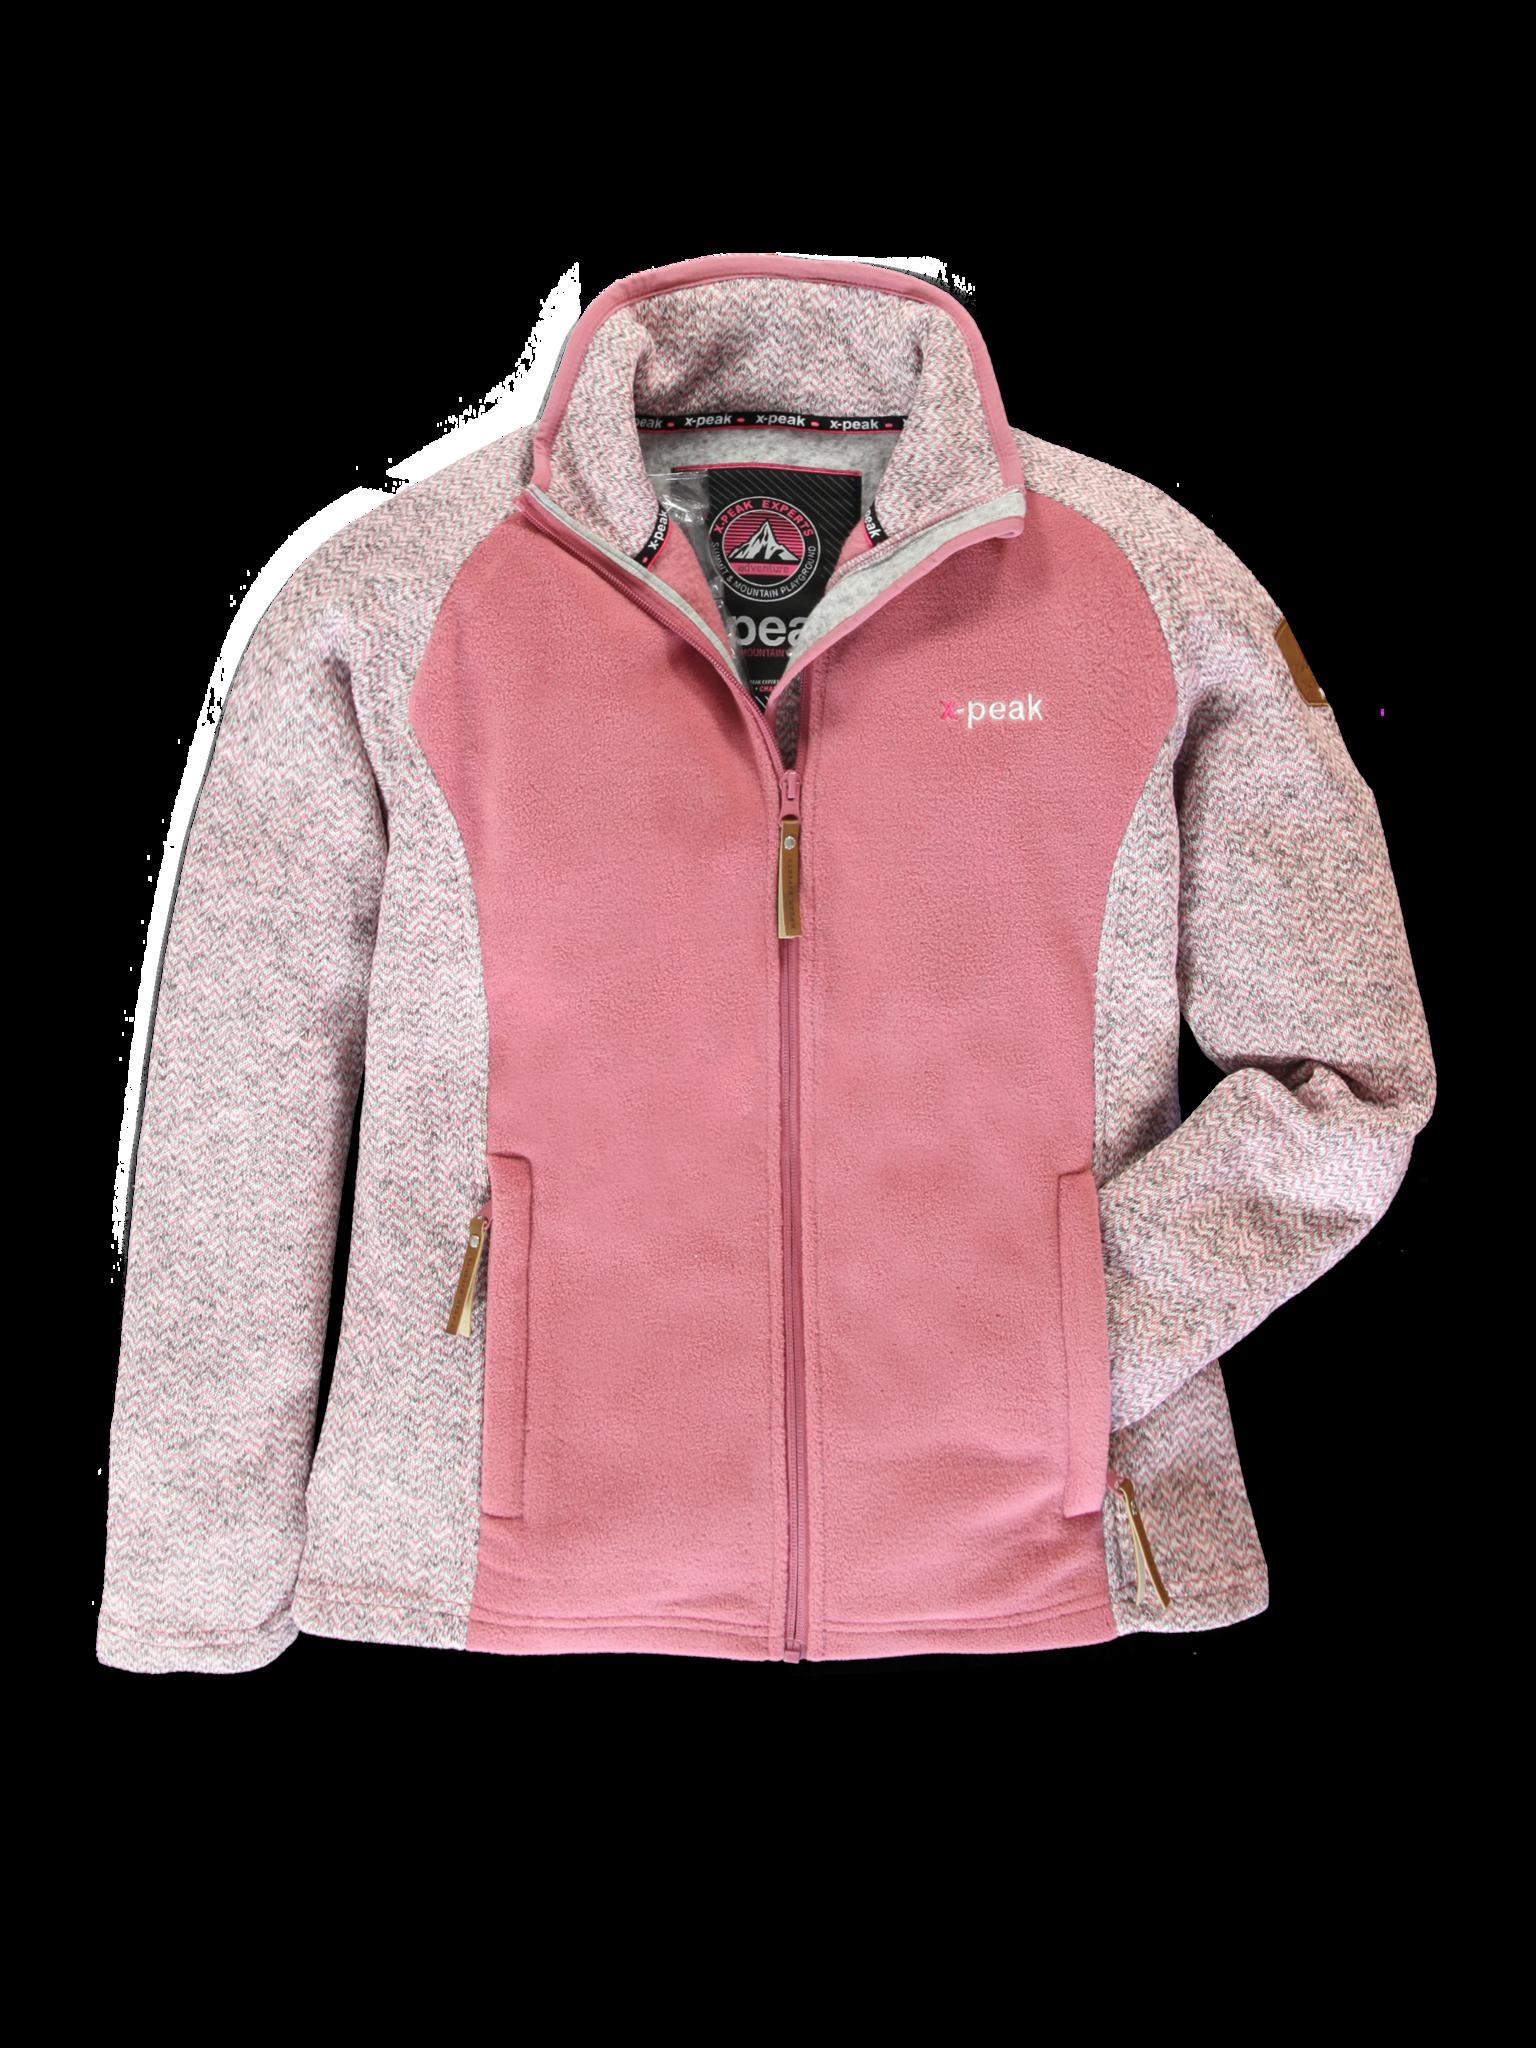 All Brands | Winterproducts Ladies | Cardigan Sweater | 18 pcs/box